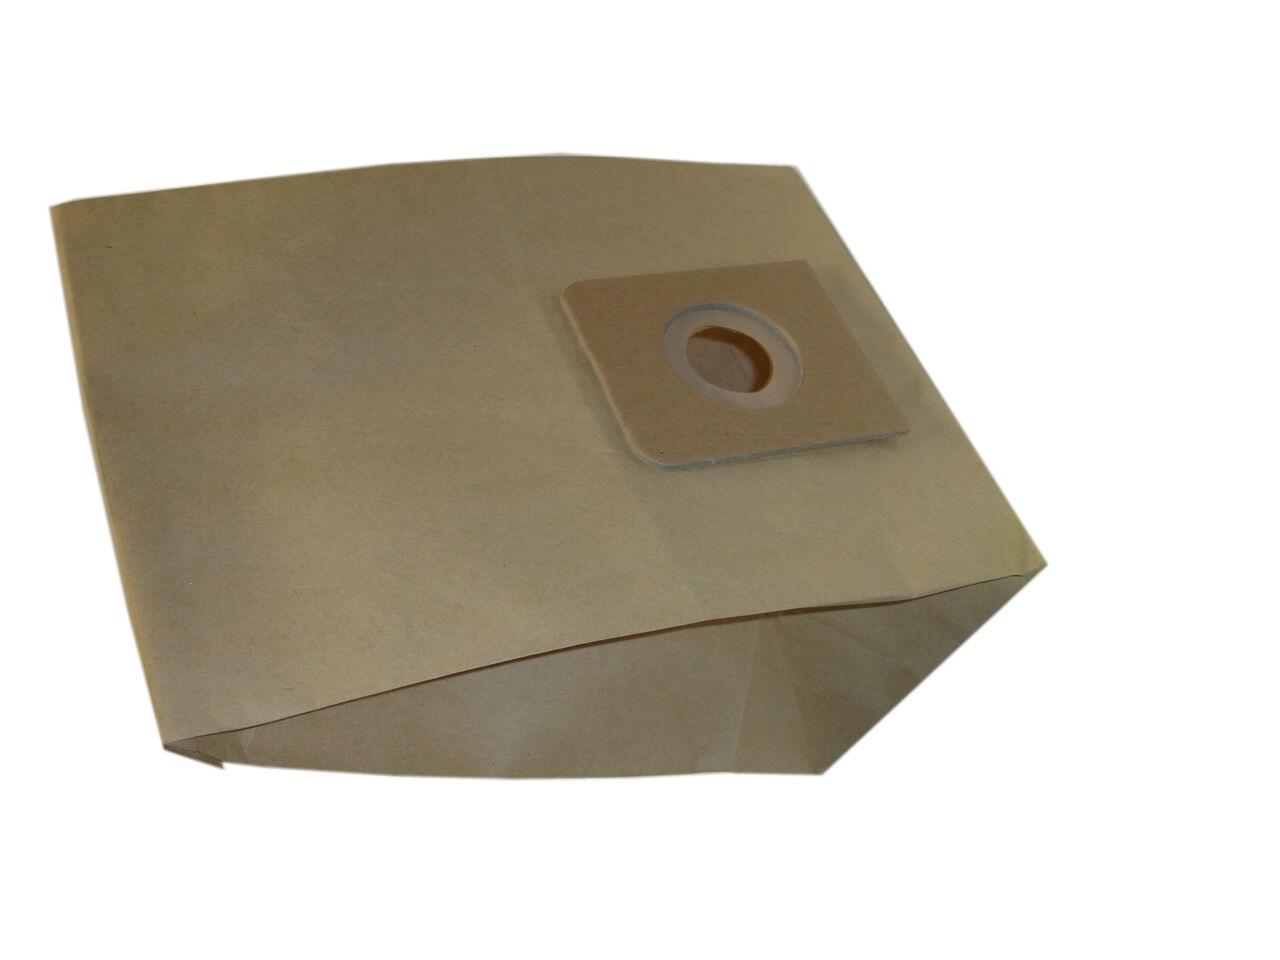 EXTRA ARNOLDI SIENA ACTION SEASONS 2405 3 x Vacuum Cleaner Bags 388 Nilfisk GM